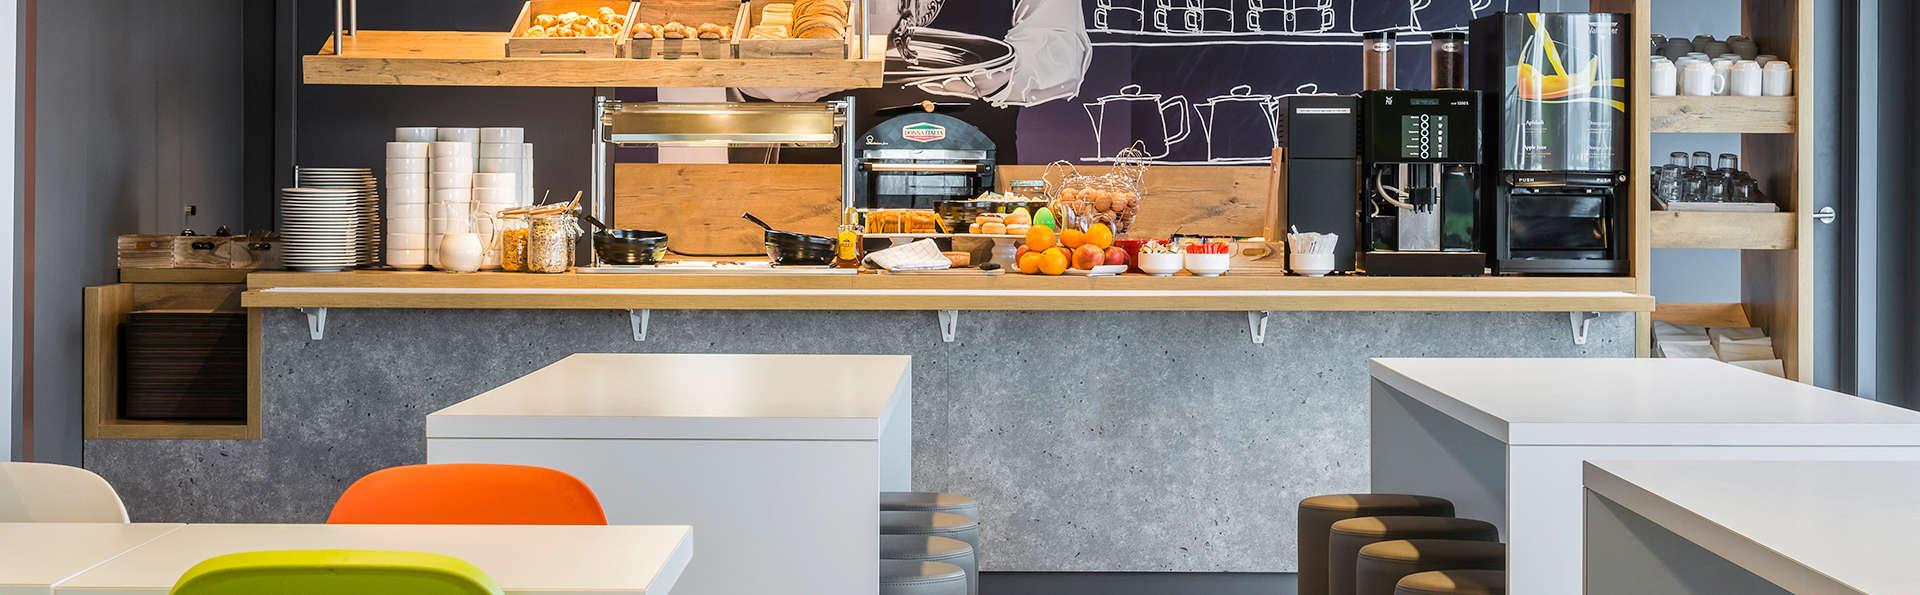 IBIS Budget Blankenberge - Edit_Restaurant.jpg